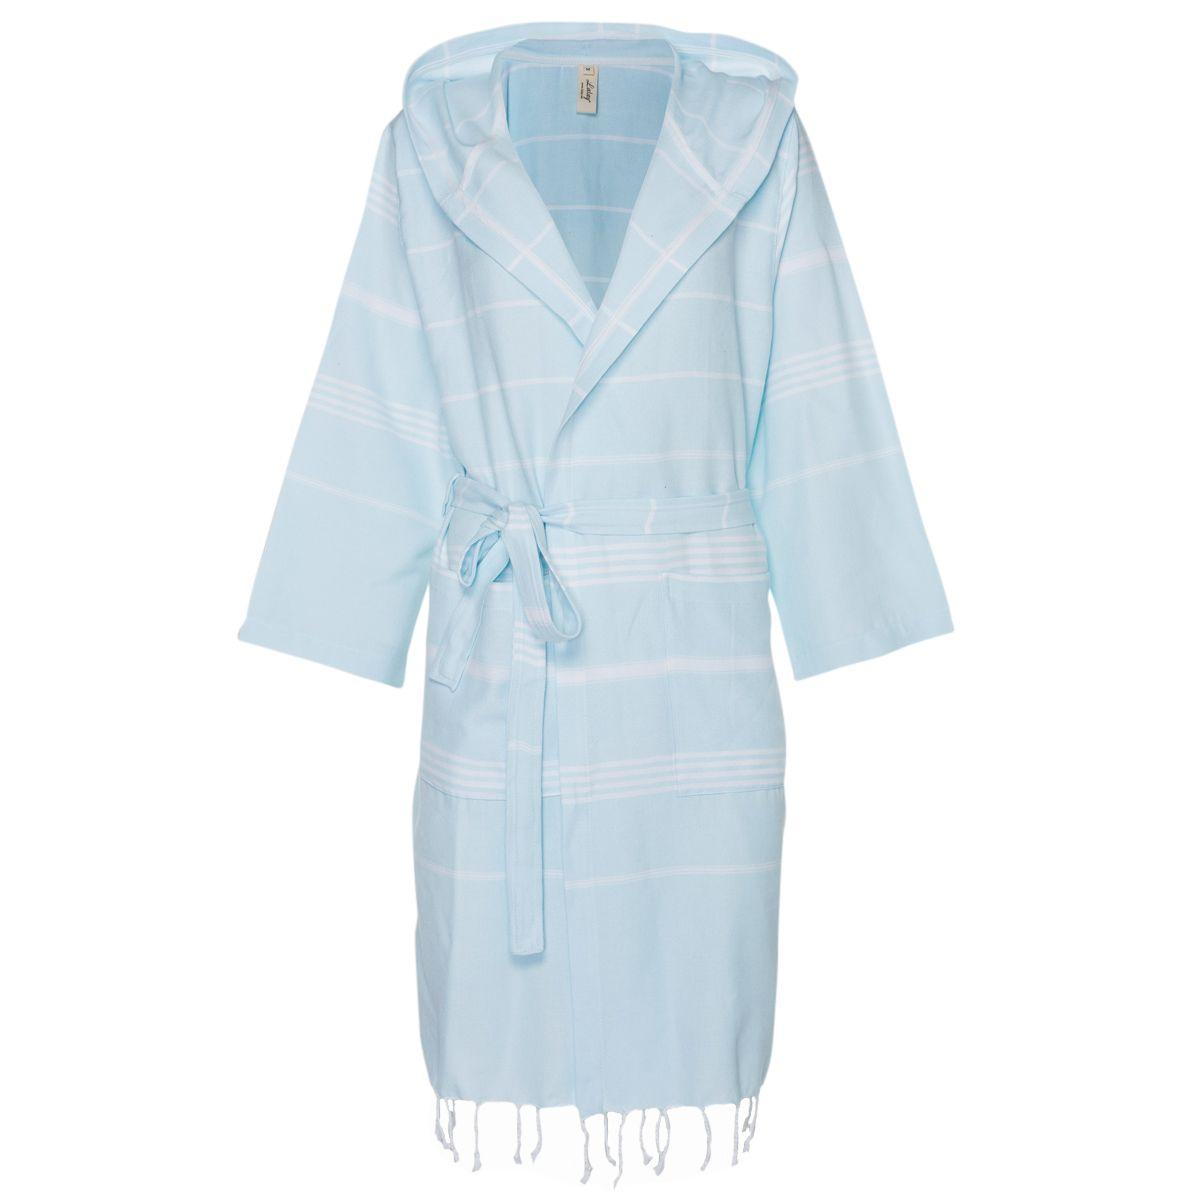 Bornoz Leyla CP - Buz Mavi